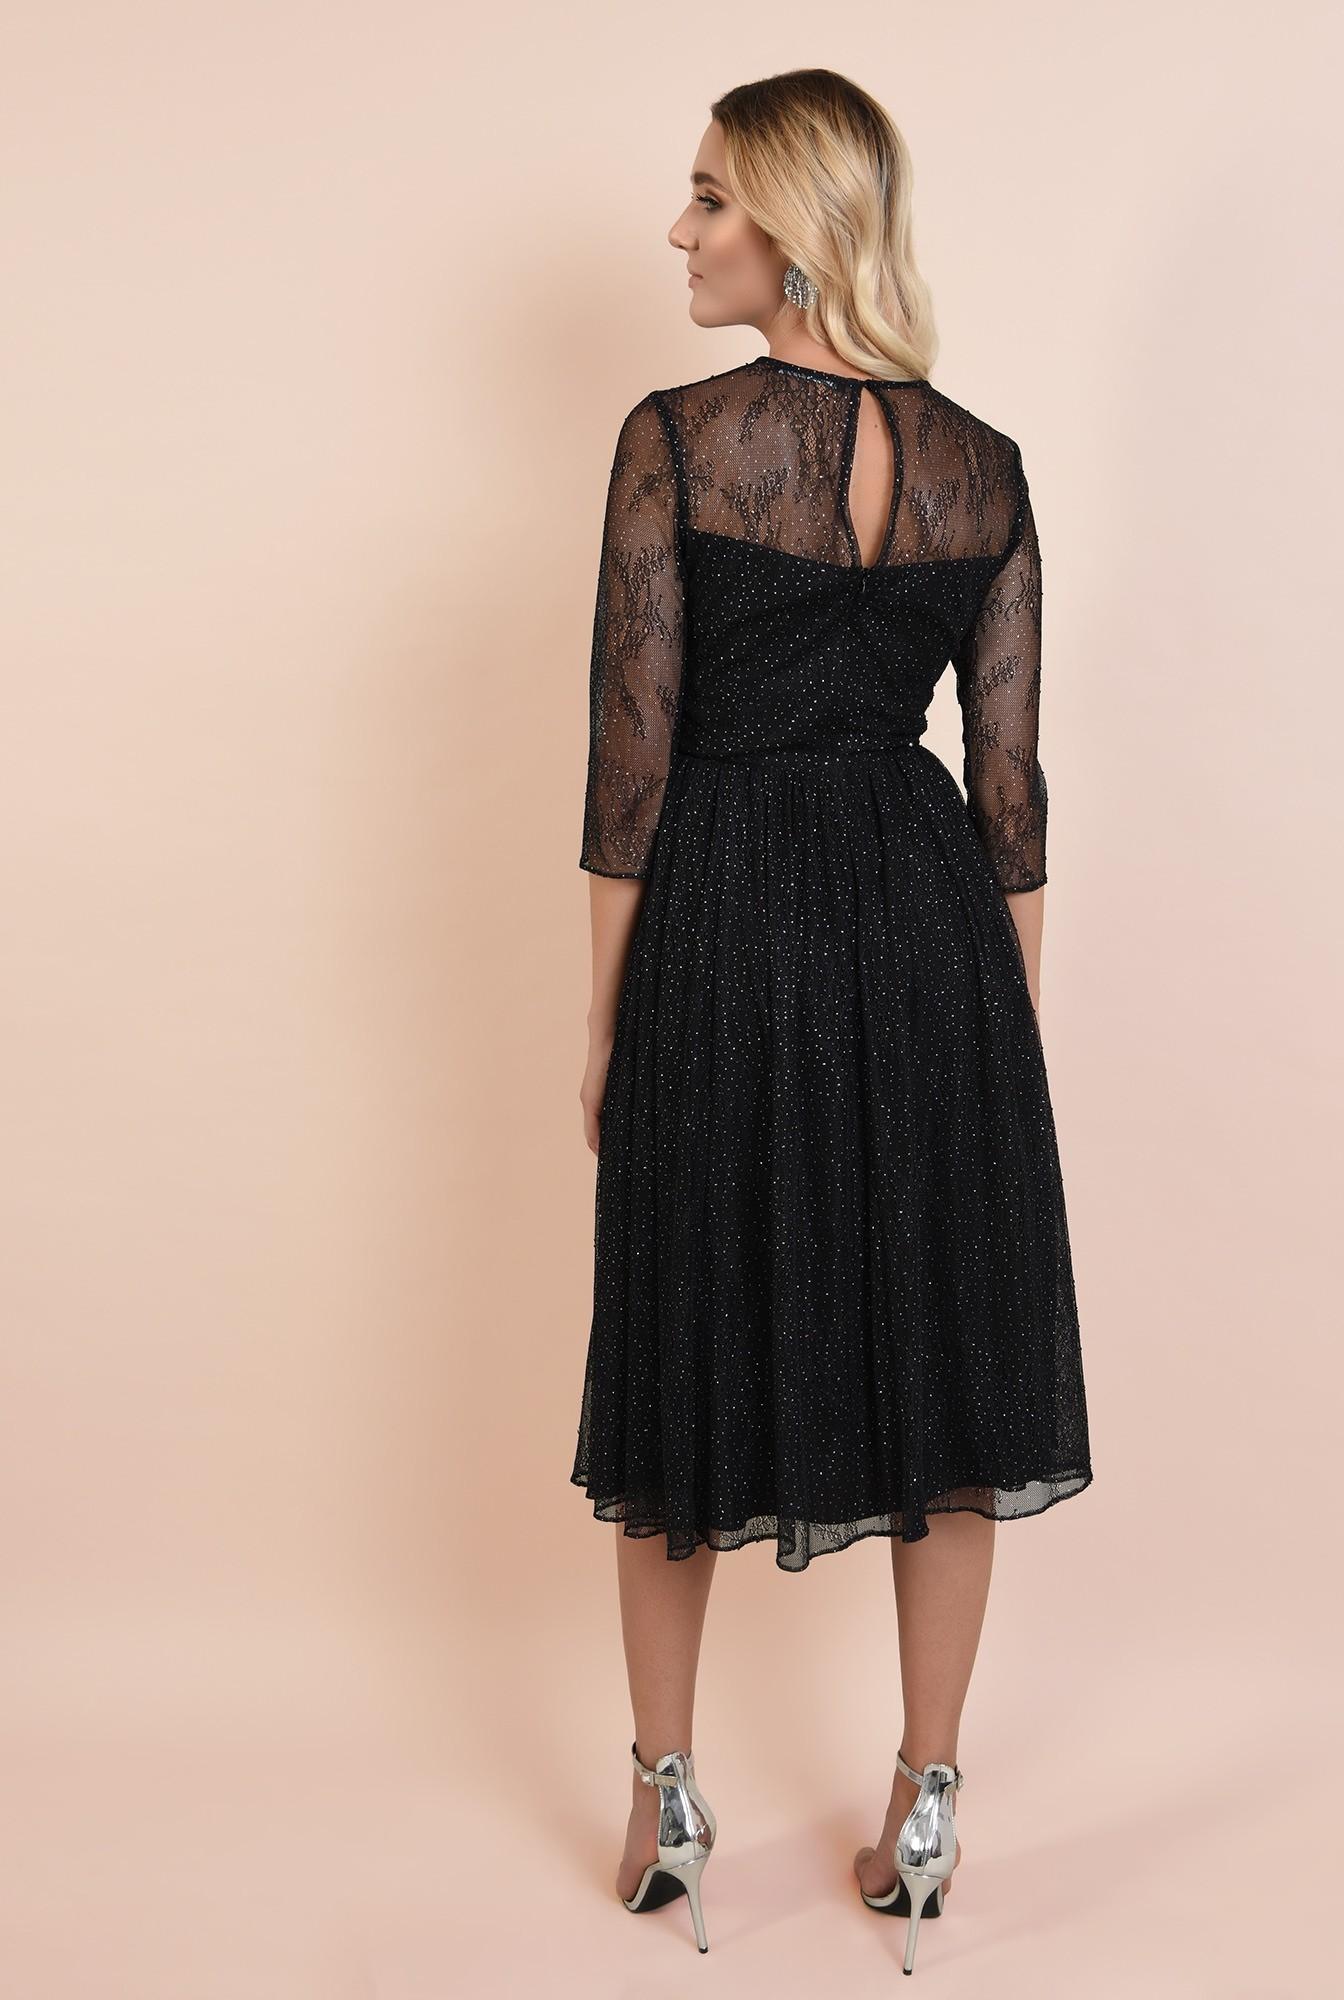 1 - rochie de seara, cu strasuri, broderie, maneci transparente, clos, Poema